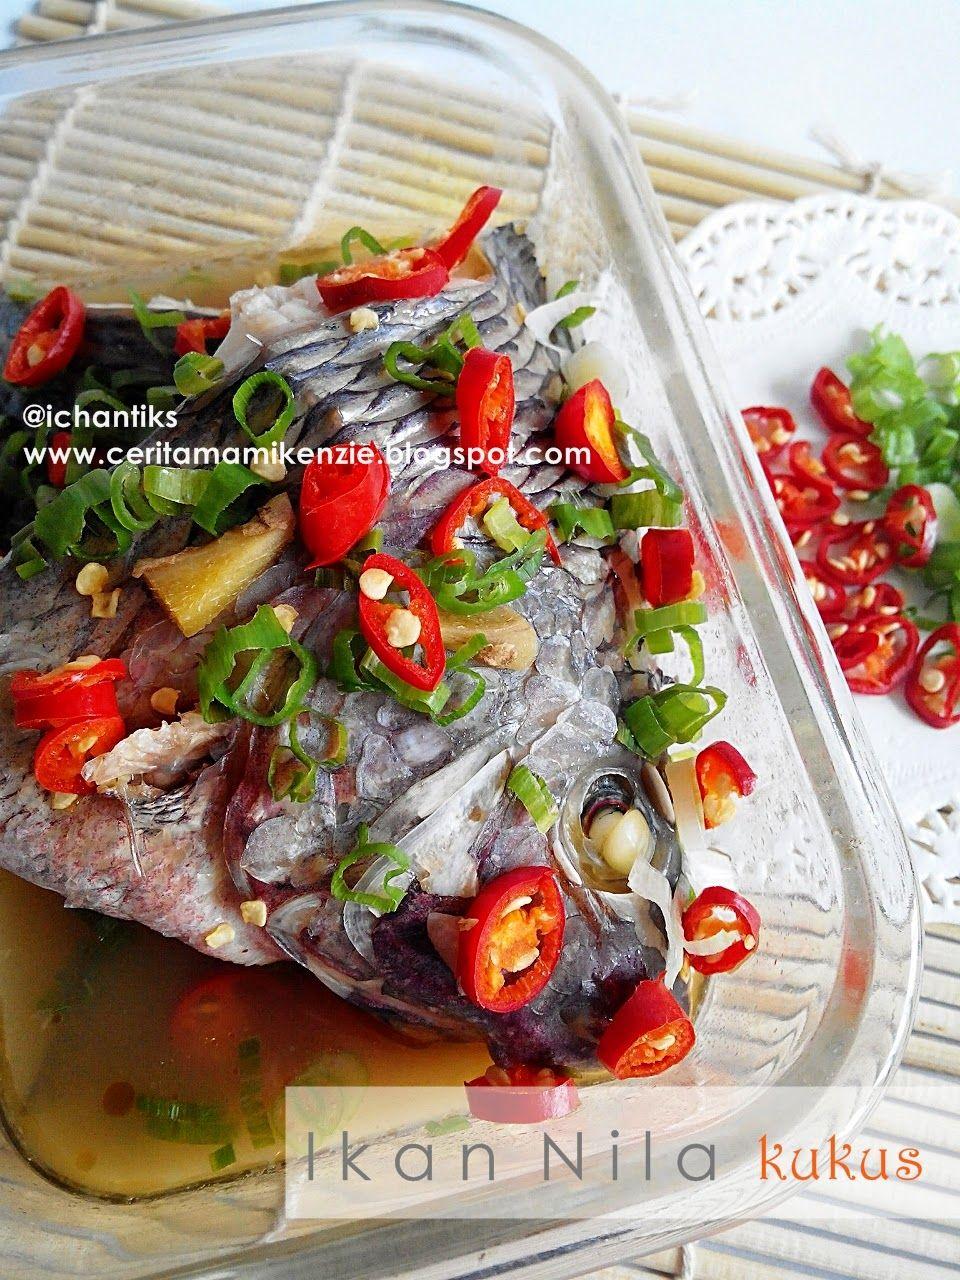 Resep Ikan Nila Kukus Cerita Mami Kenzie Resep Ikan Resep Makanan Bayi Resep Masakan